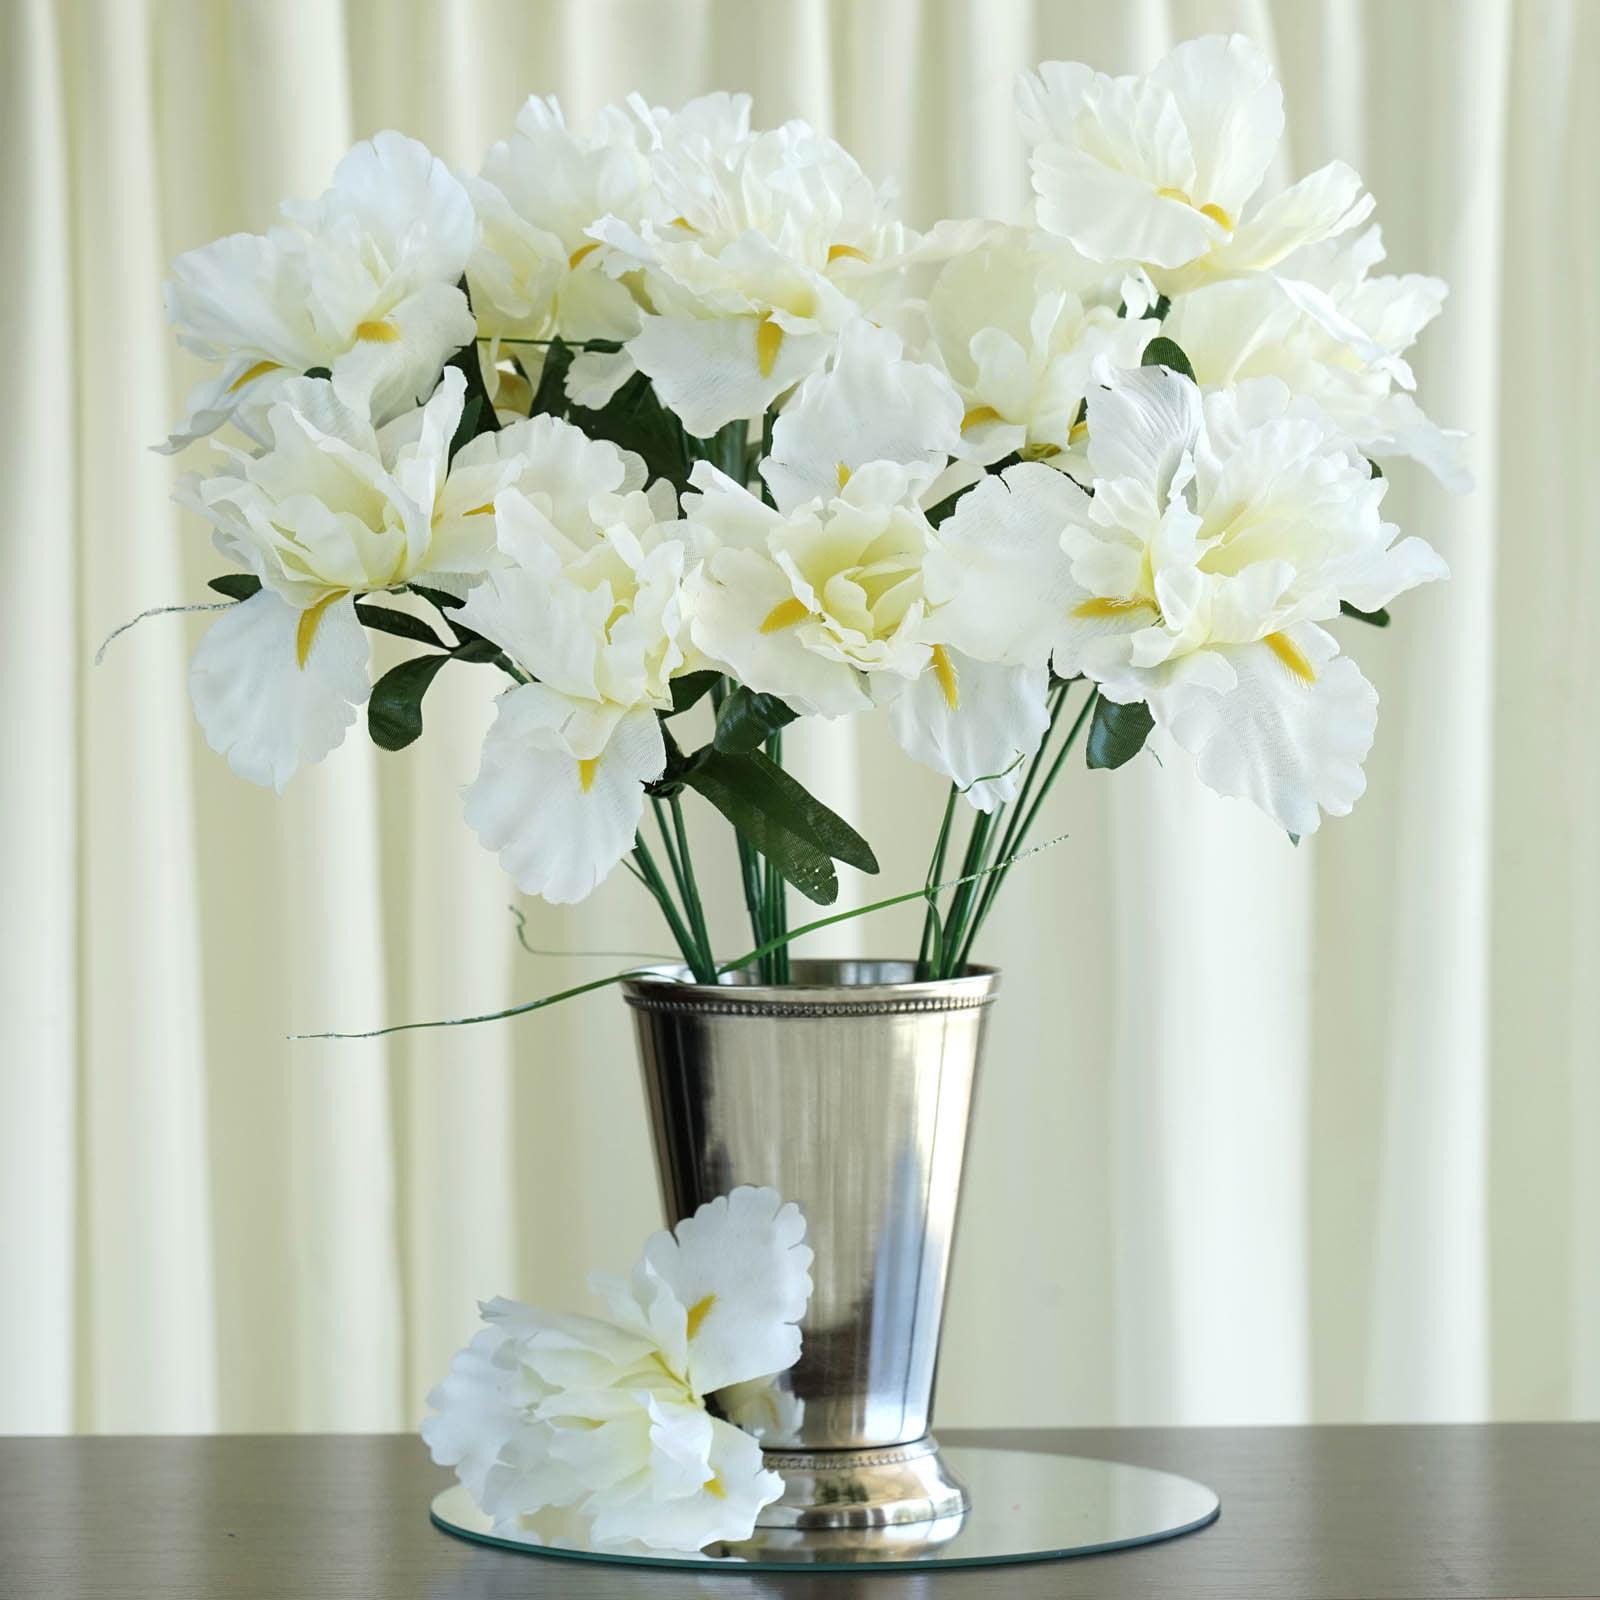 Efavormart 60 pcs artificial iris flowers for diy wedding bouquet efavormart 60 pcs artificial iris flowers for diy wedding bouquet centerpieces arrangements baby shower home decoration 12 bushes walmart izmirmasajfo